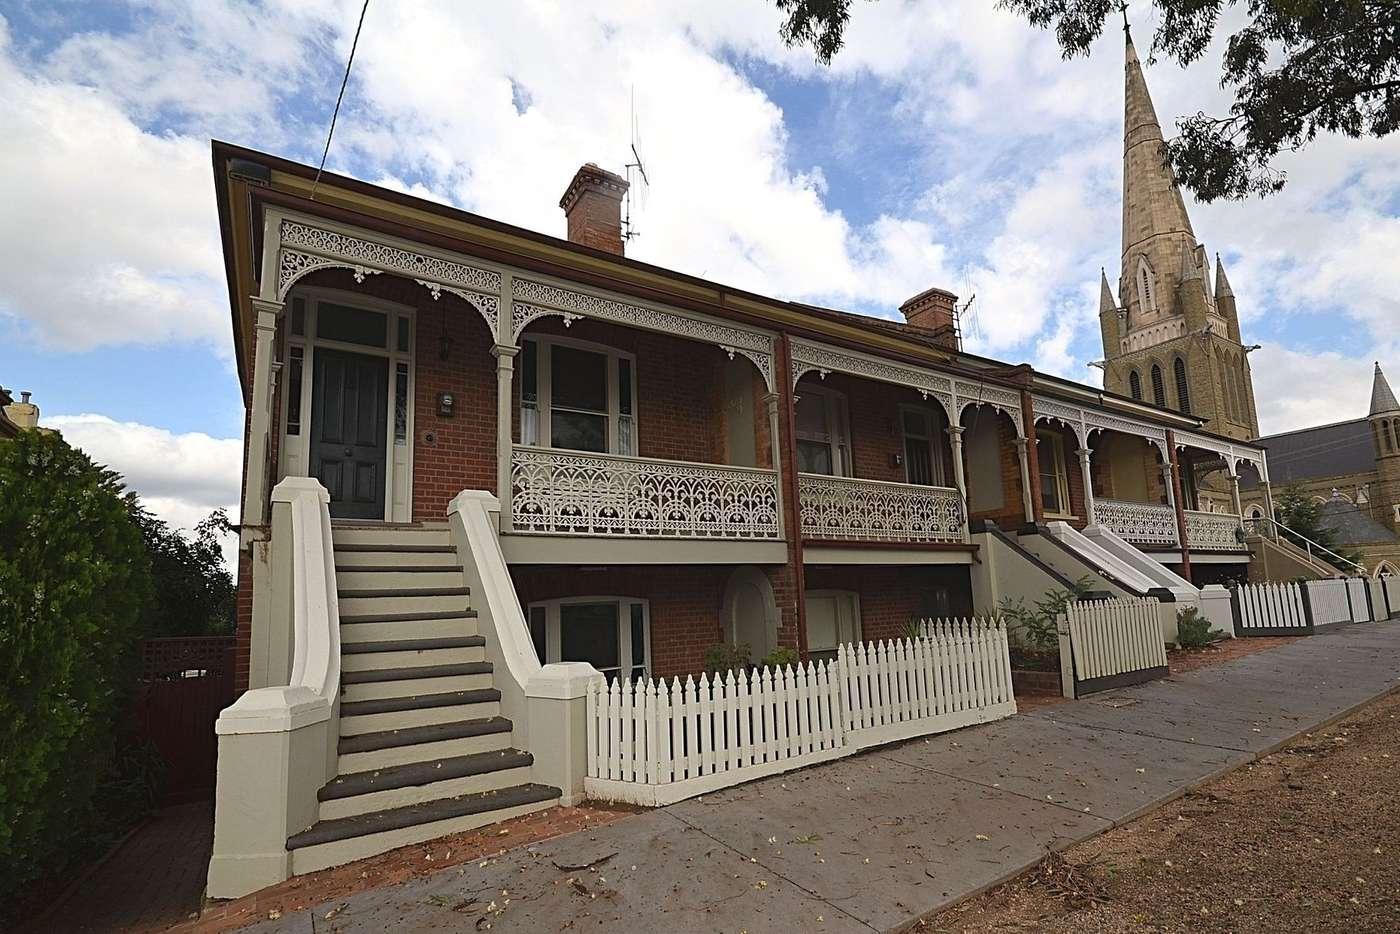 Main view of Homely house listing, 35 Mackenzie Street, Bendigo VIC 3550